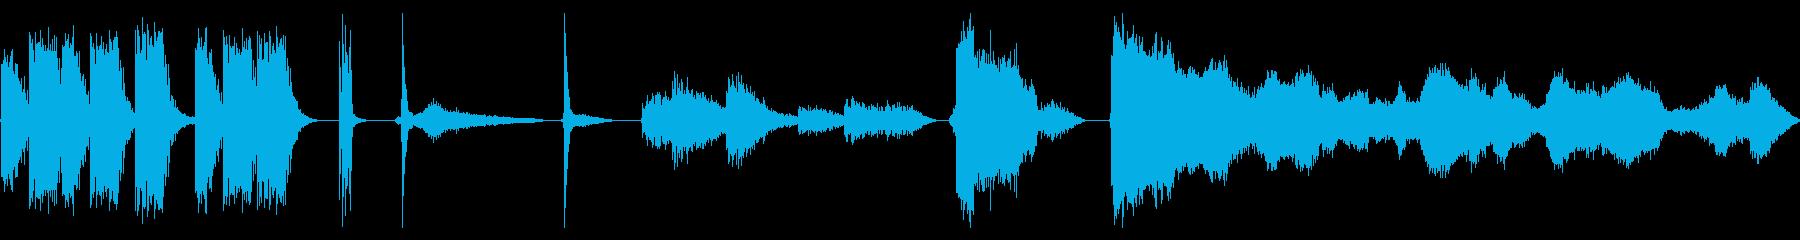 CANNON、HEAVY、SHOO...の再生済みの波形